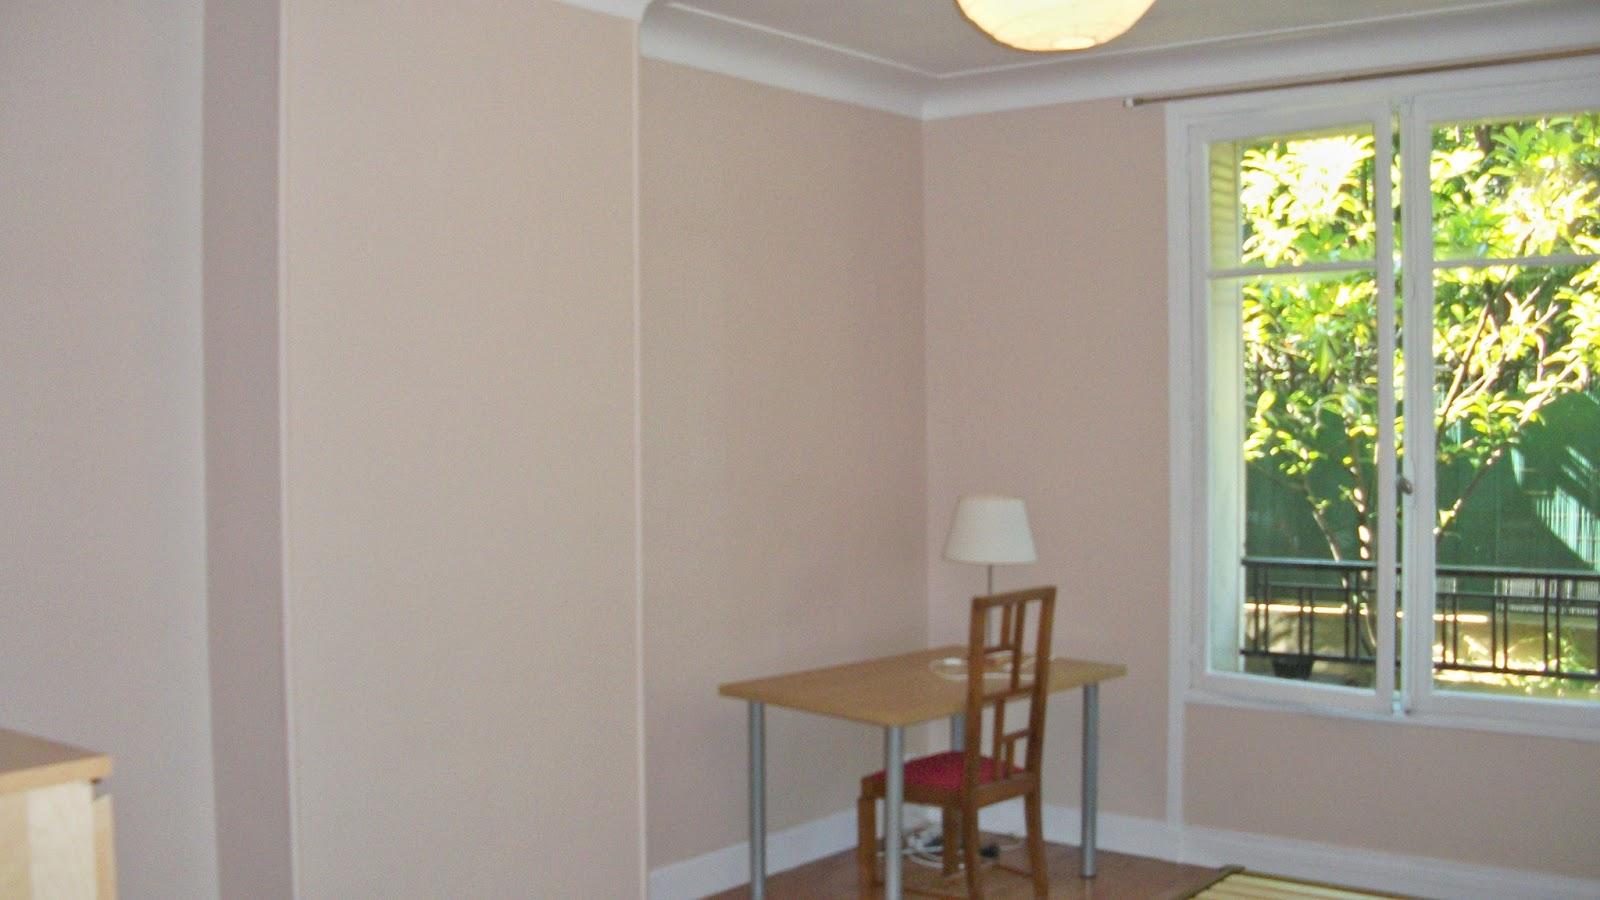 volet roulant en facade prix montauban tarif horaire d. Black Bedroom Furniture Sets. Home Design Ideas